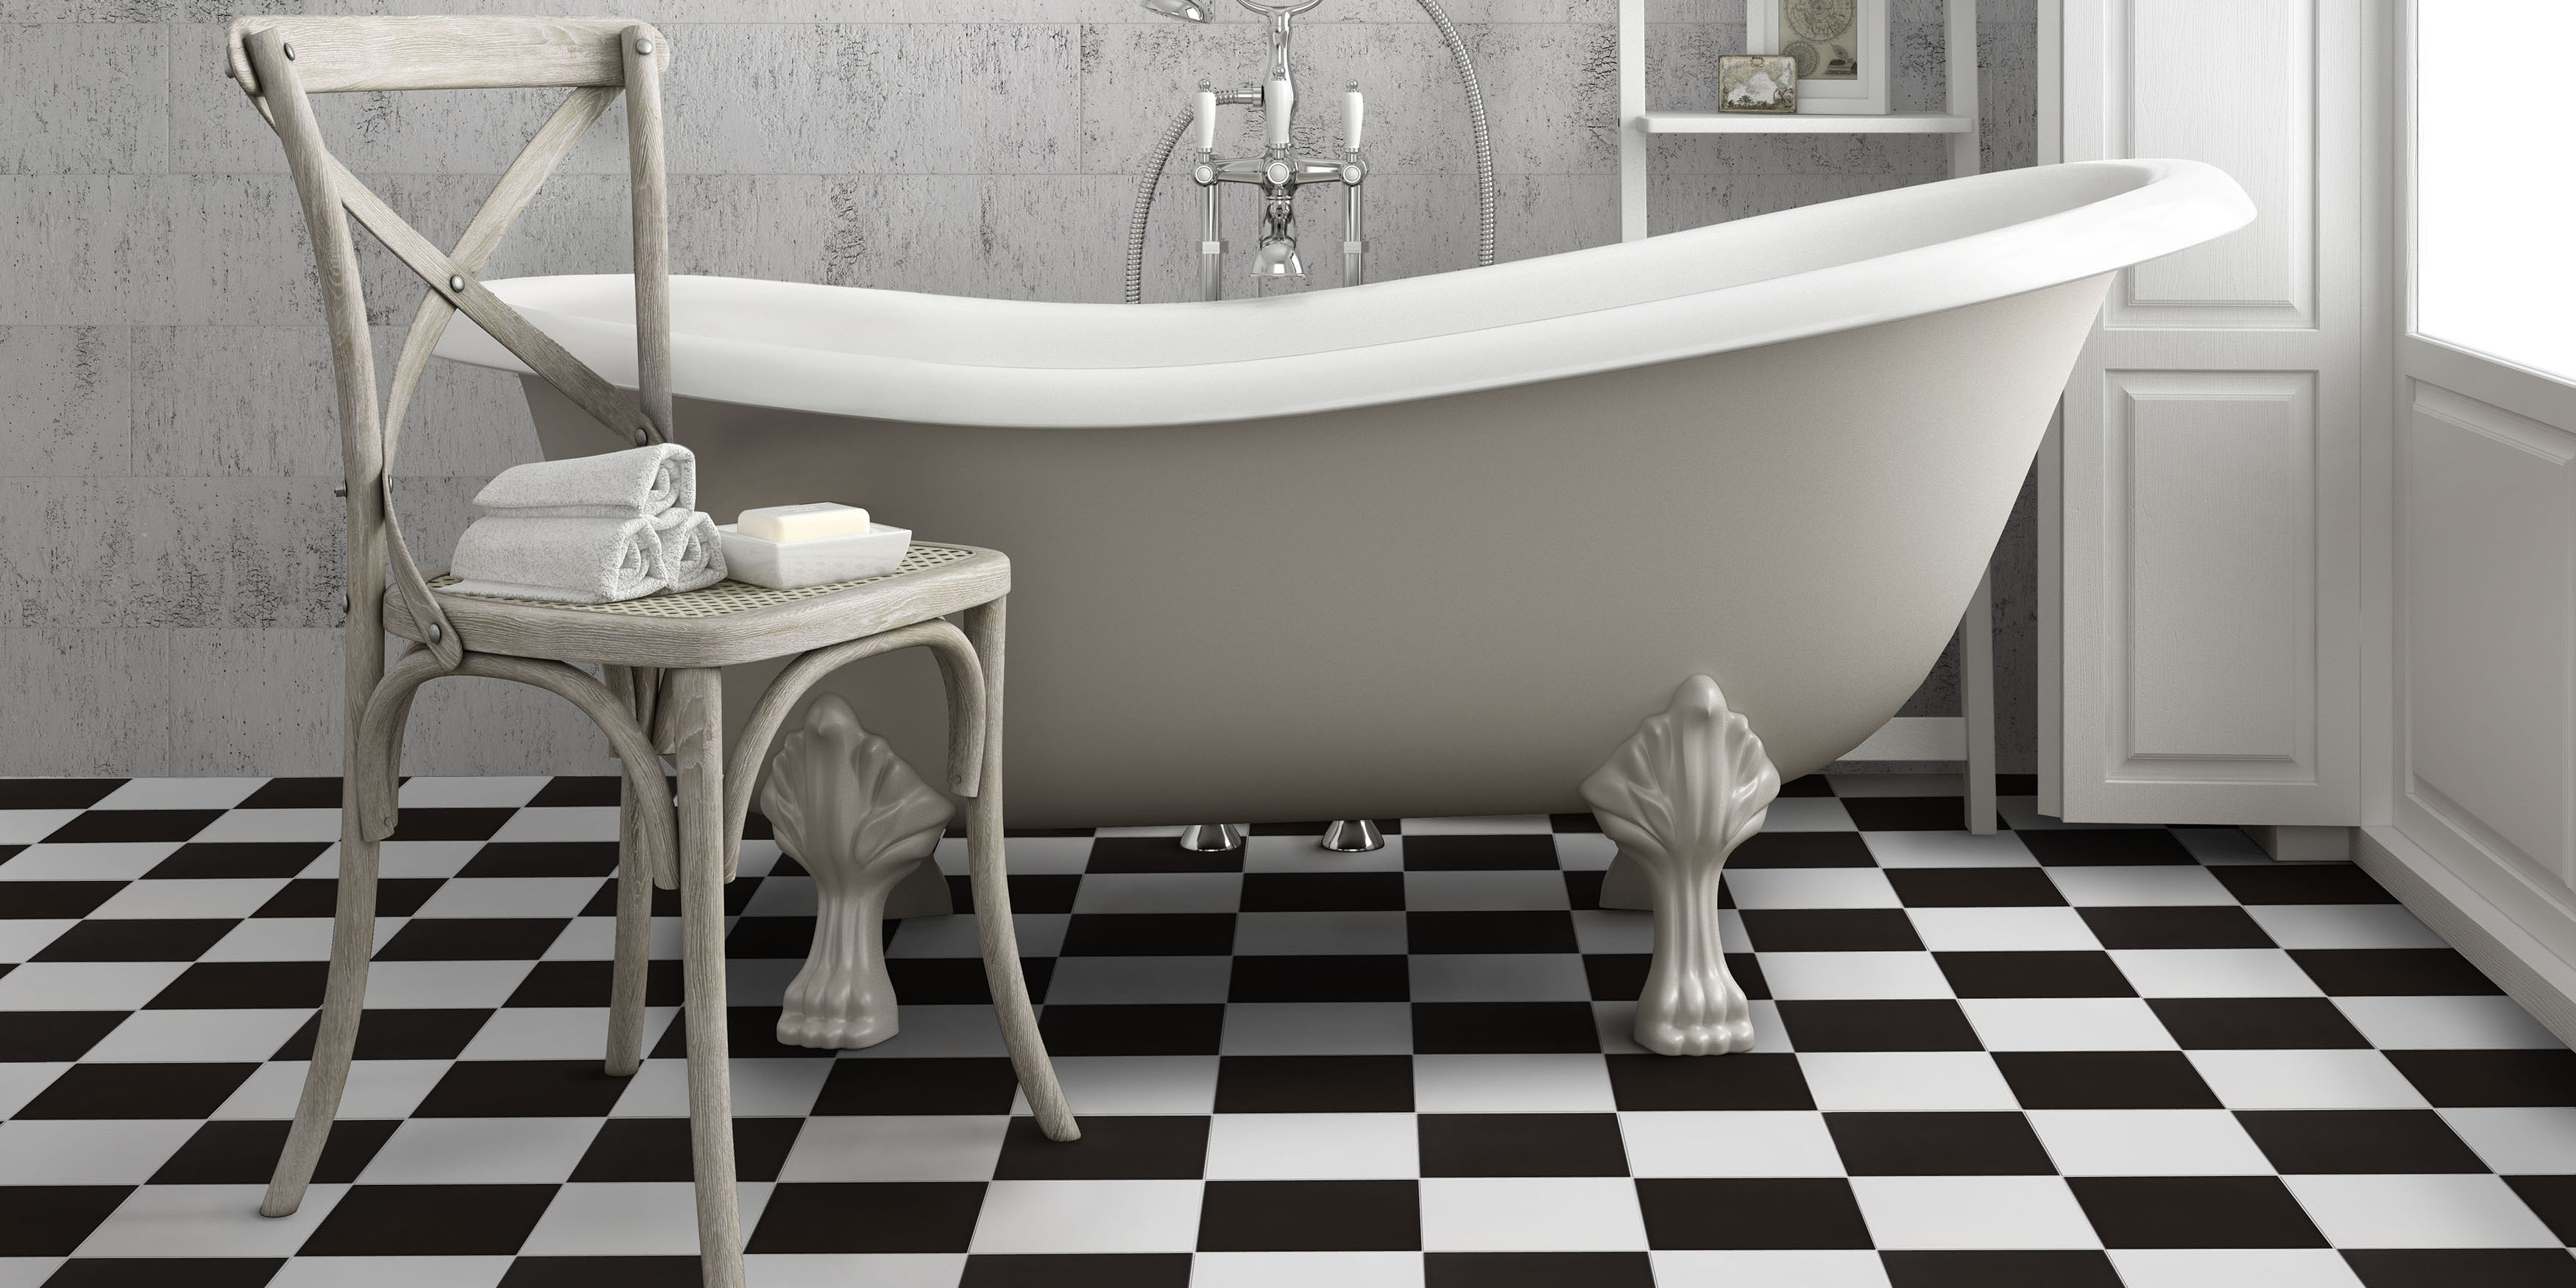 Bathroom- Checker